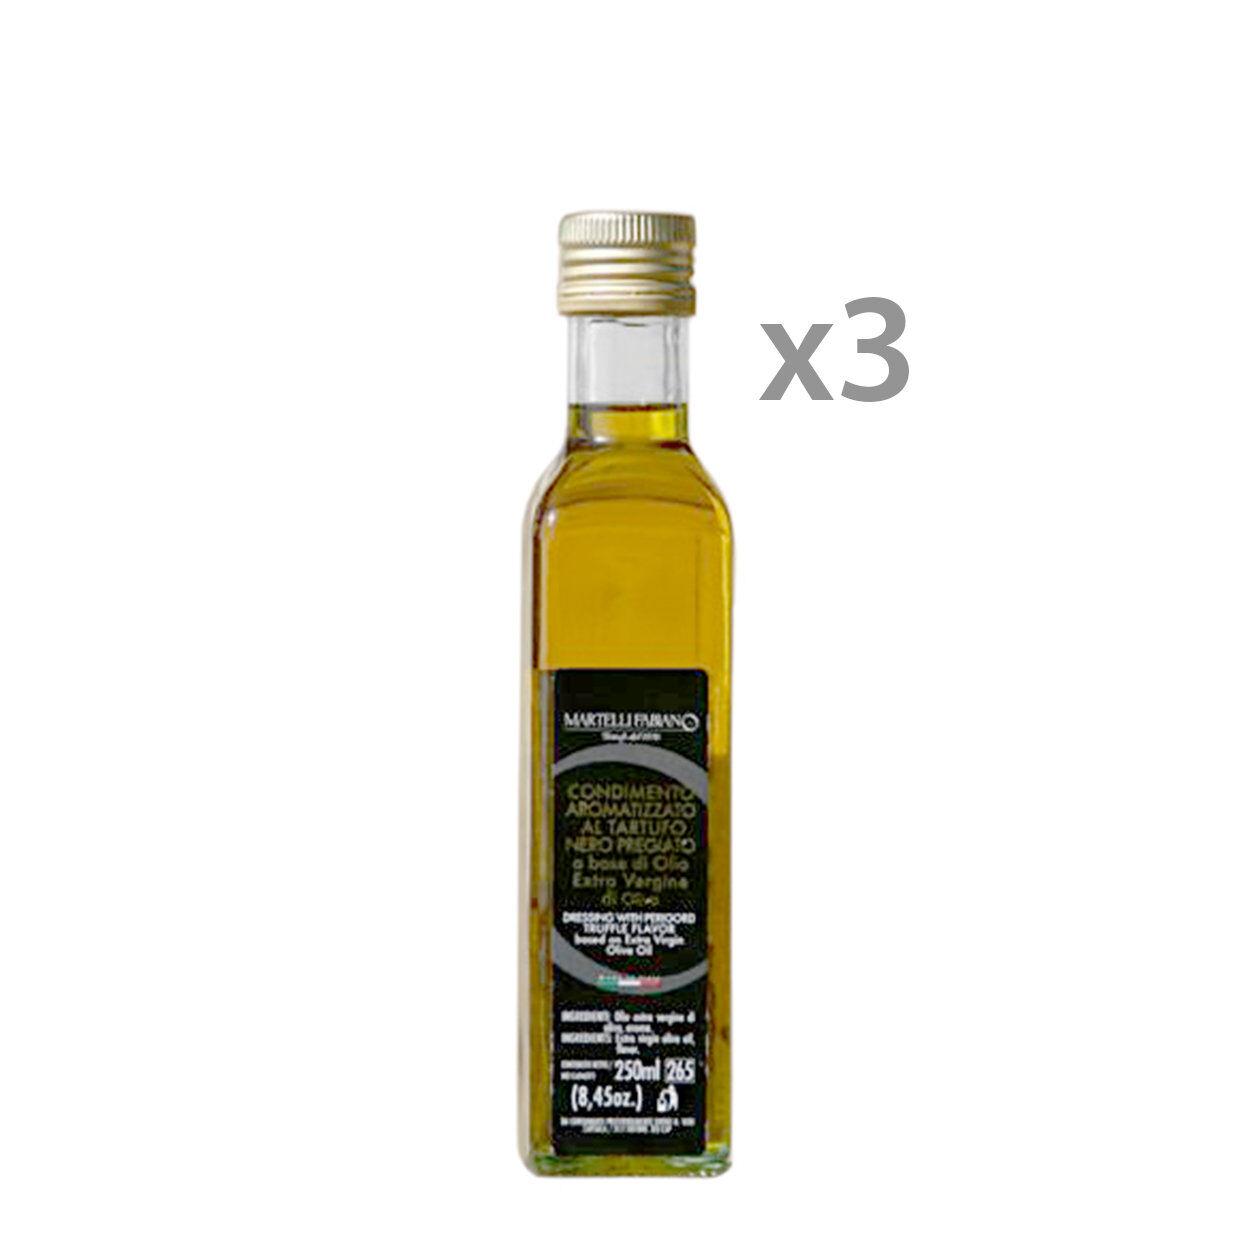 Martelli Fabiano Tartufi 3 bottiglie - Condimento aromatizzato al Tartufo Nero Pregiato 250 ml